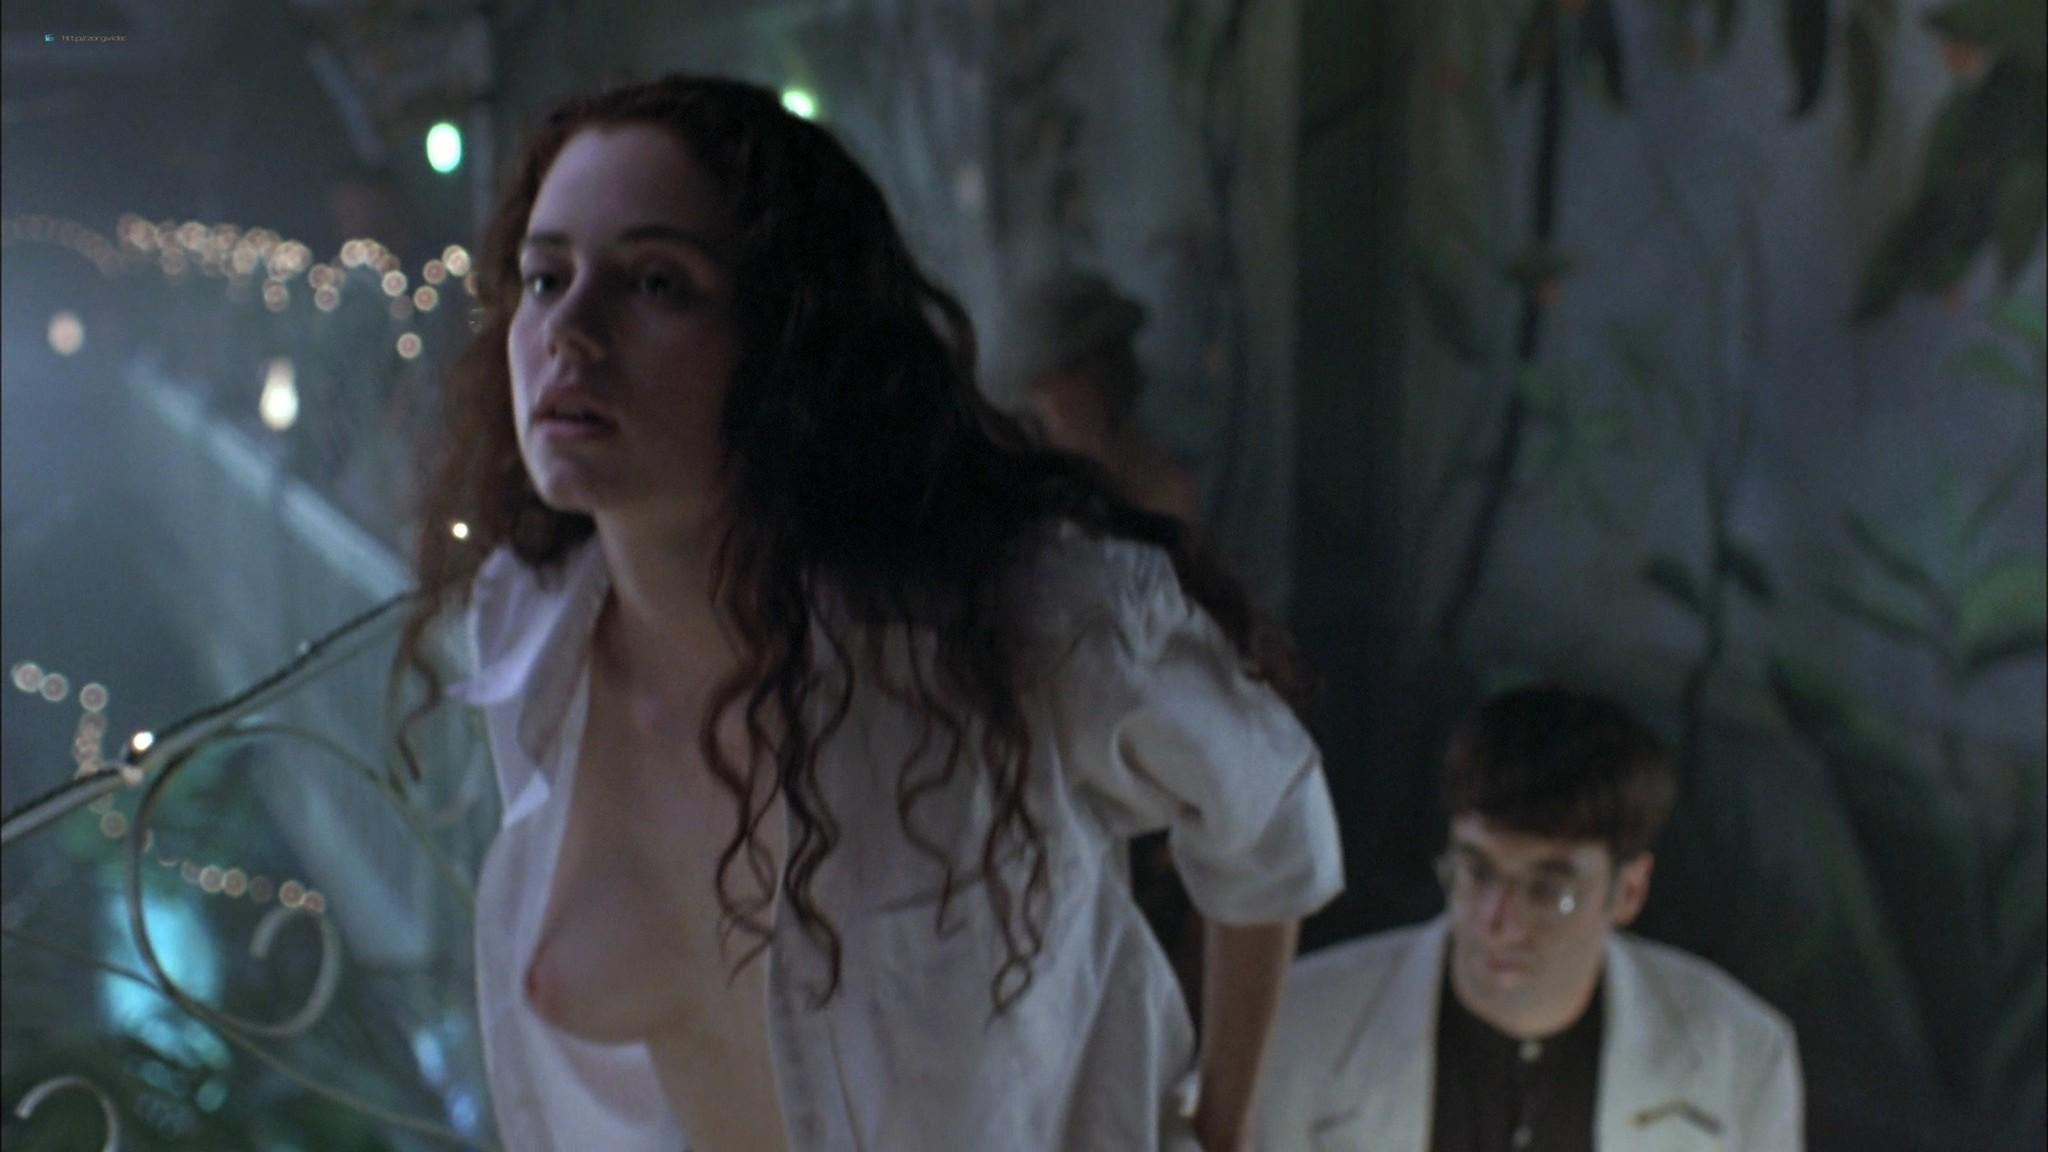 Mia Kirshner nude Arsinée Khanjian sexy - Exotica (1994) HD 1080p BluRay REMUX (6)